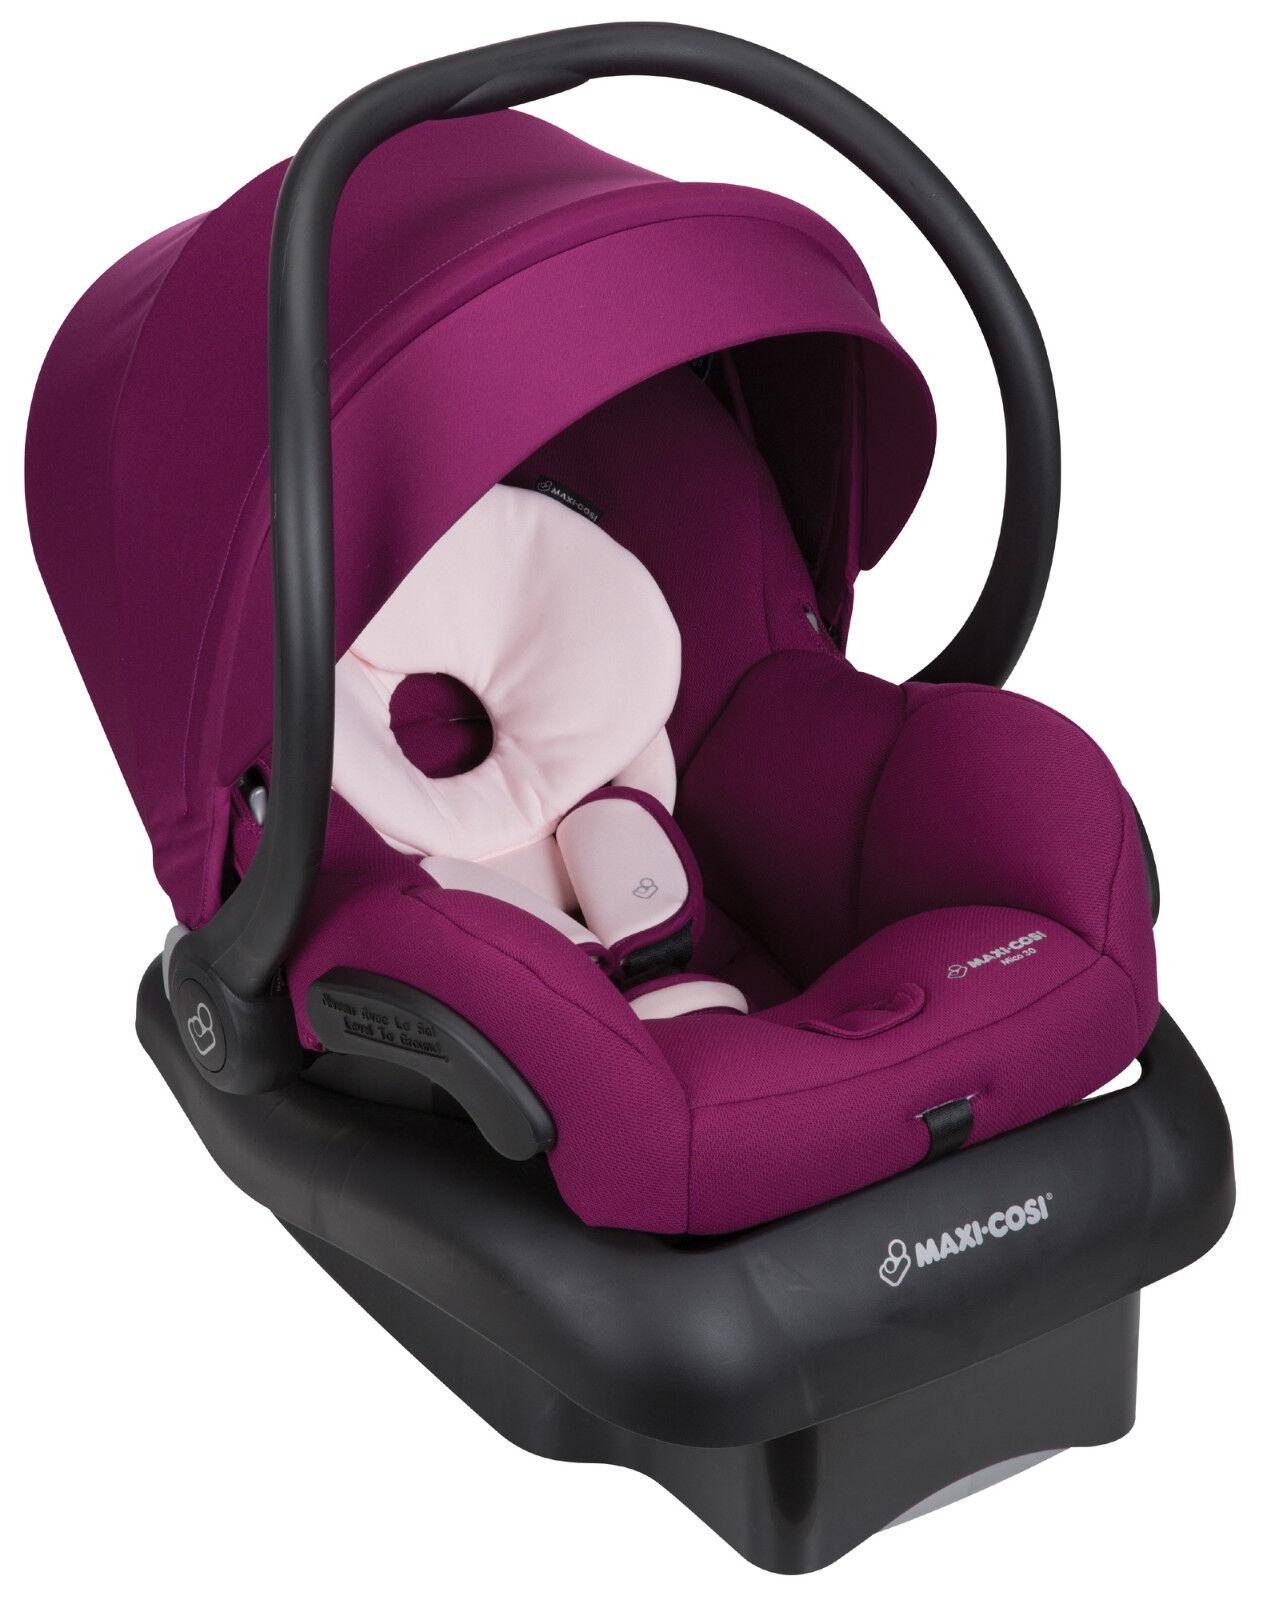 Maxi-Cosi Mico 30 Infant Car Seat, Violet Caspia